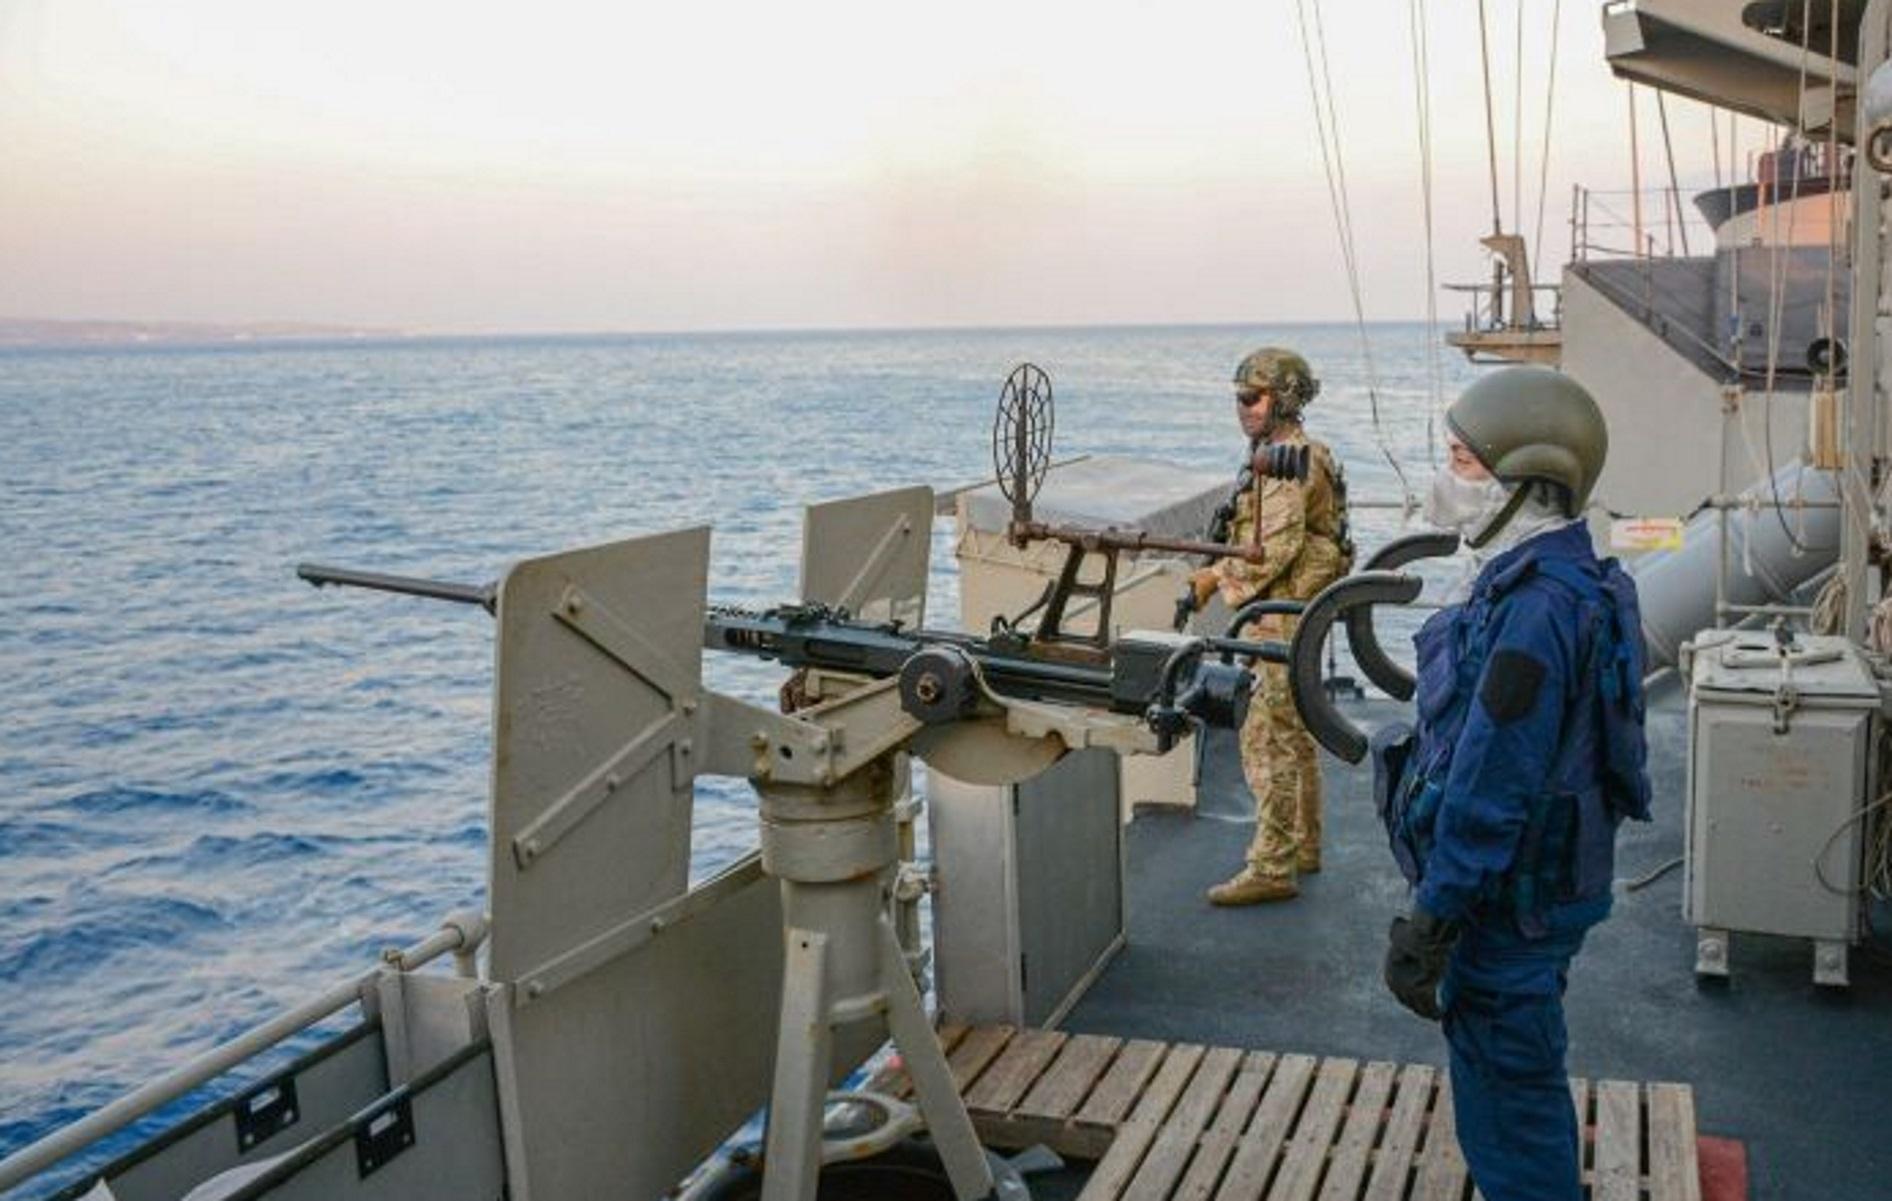 EUNOMIA: Η τετραμερής συμμαχική άσκηση «κλειδώνει» την ανατολική Μεσόγειο!